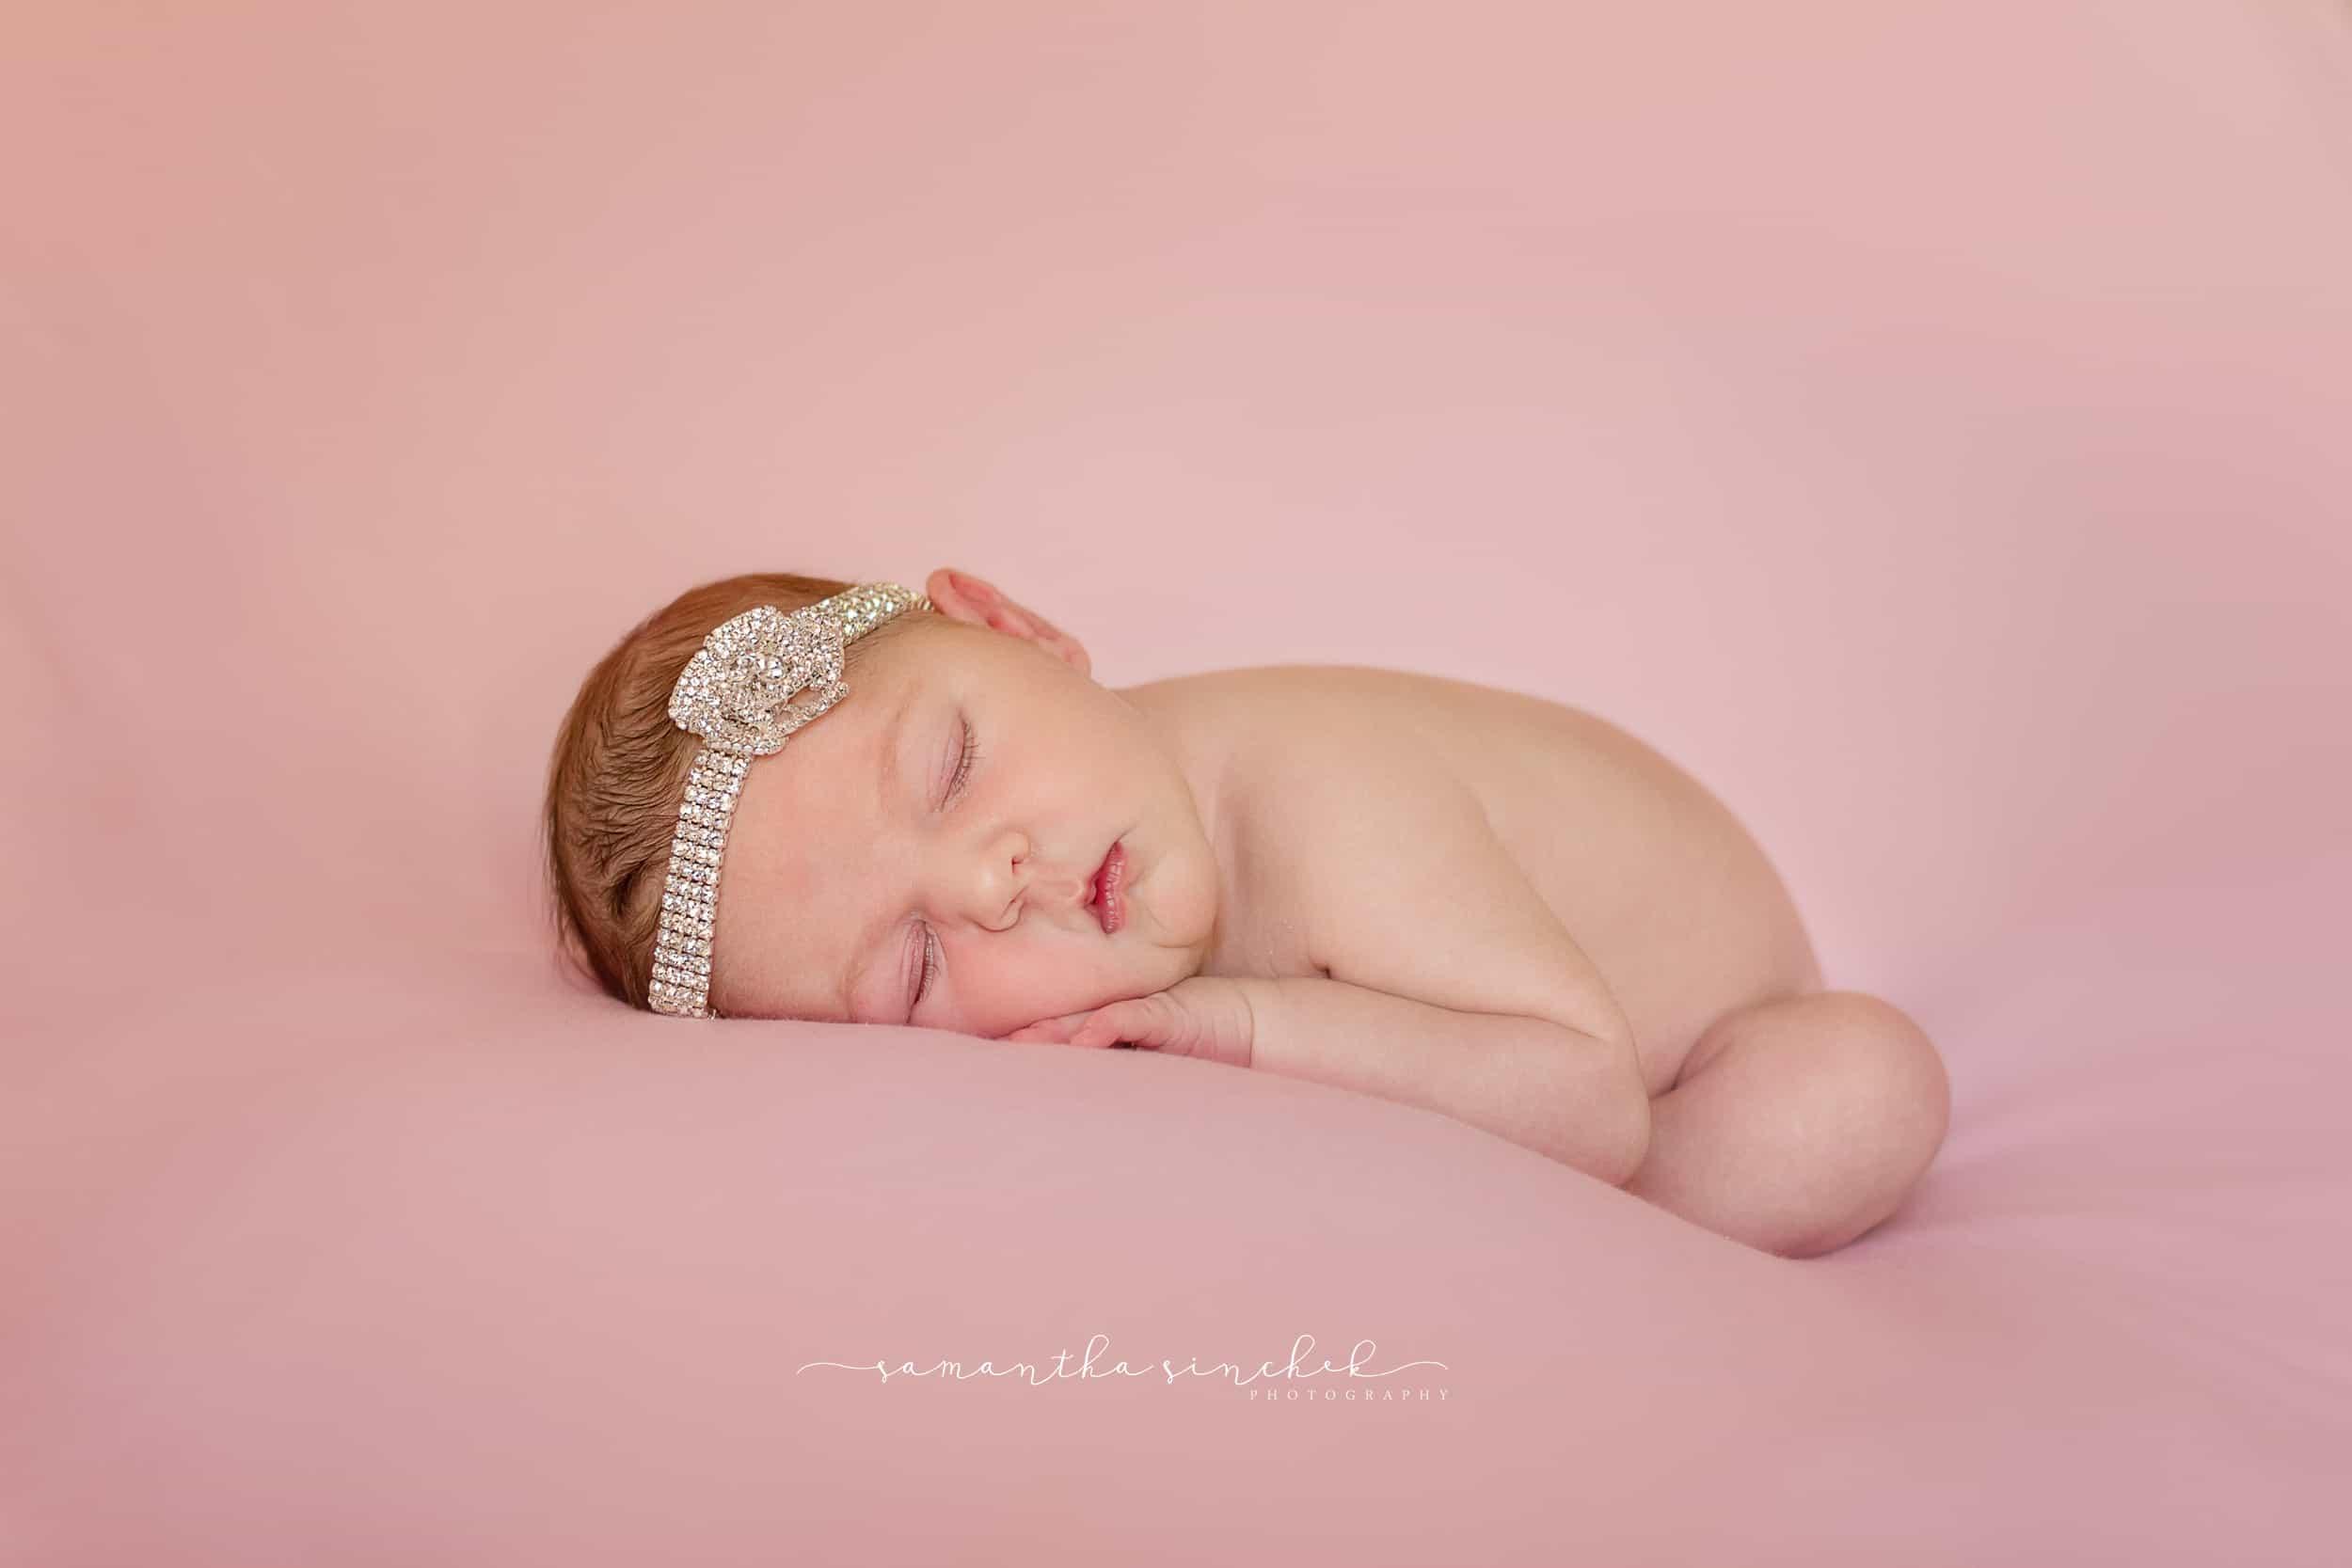 Cincinnati newborn sleeps wearing diamond headband